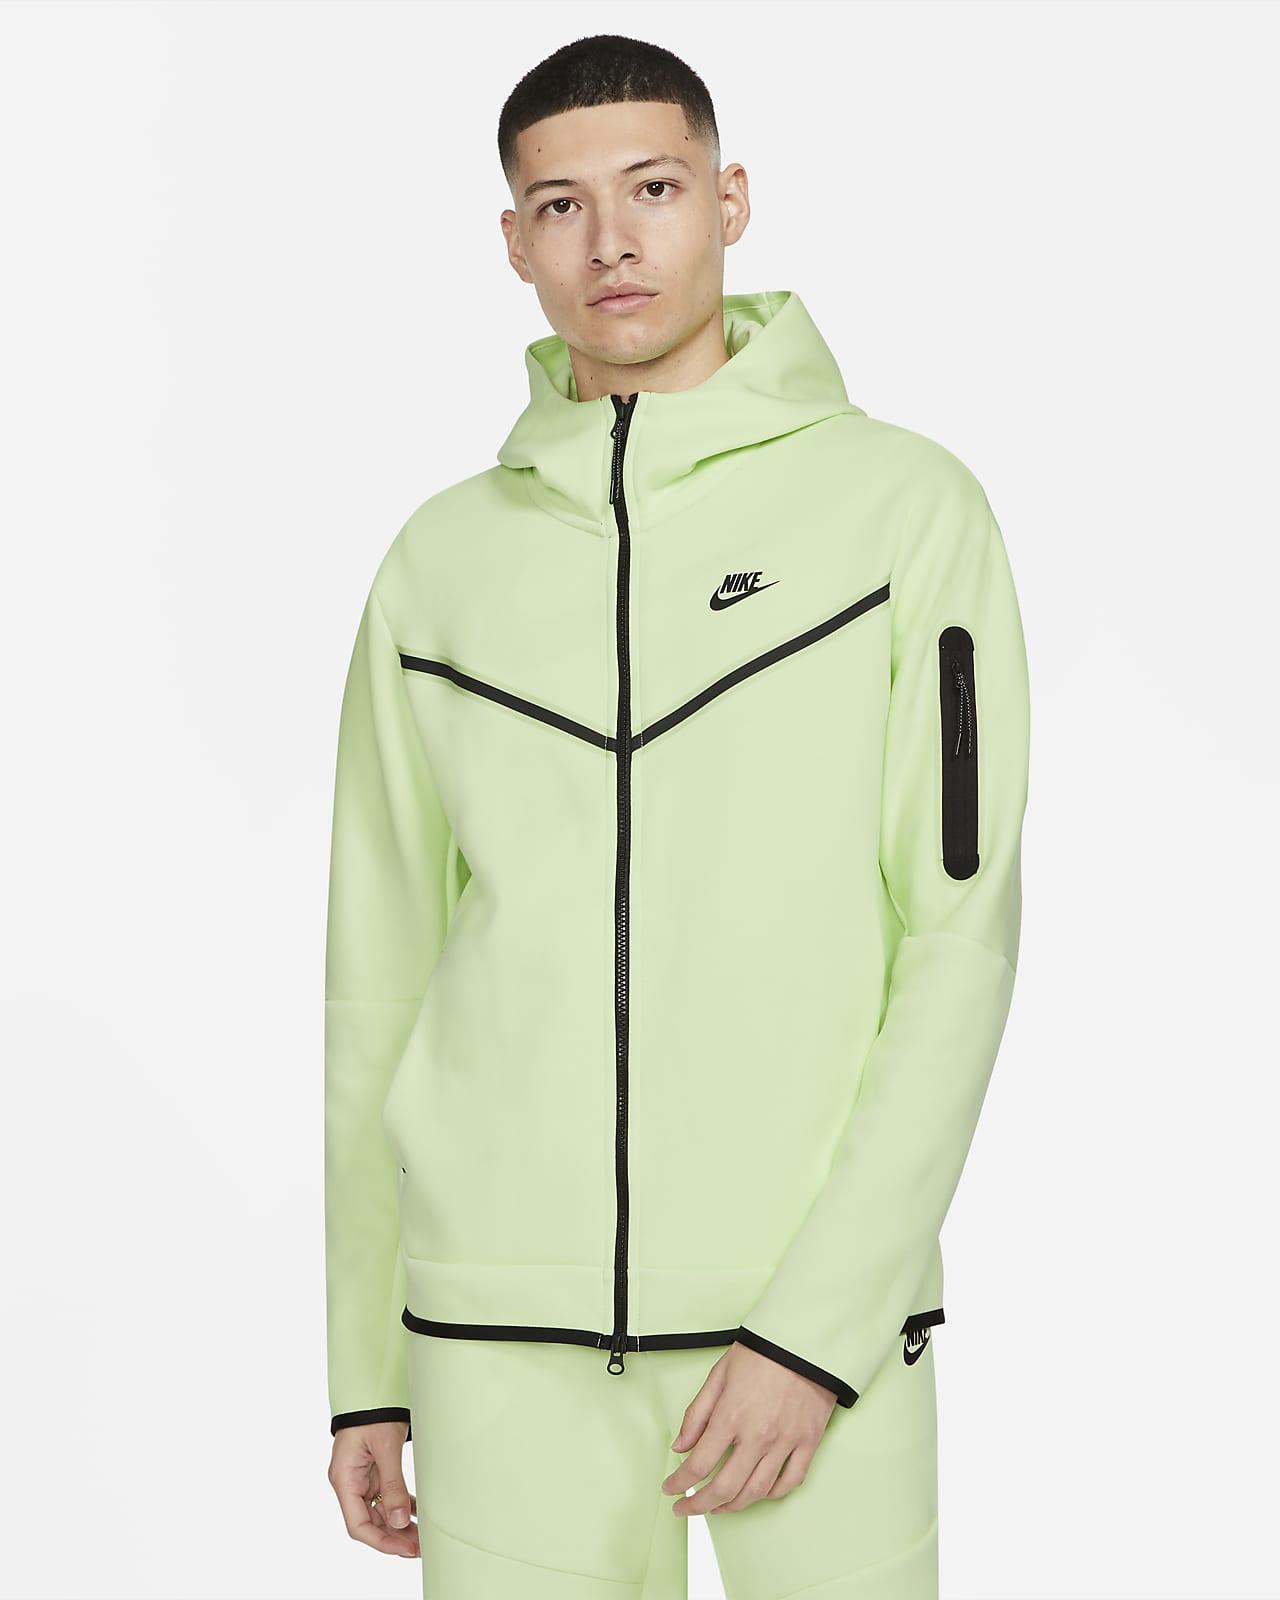 Nike Sportswear Tech Fleece Sudadera con capucha con cremallera completa - Hombre